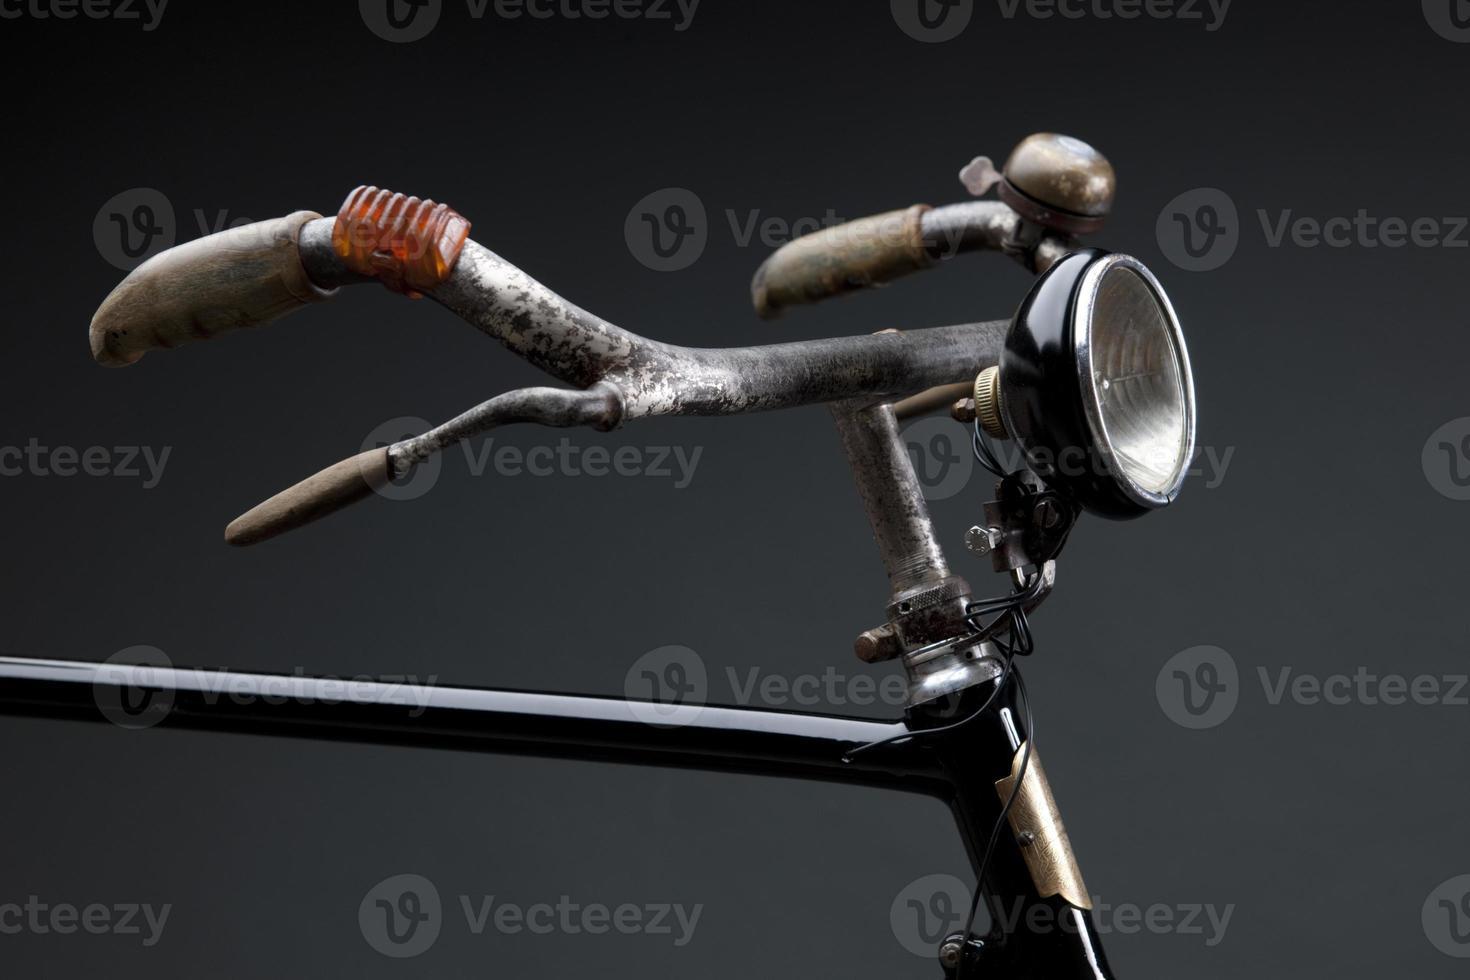 Bicicletta d'epoca foto